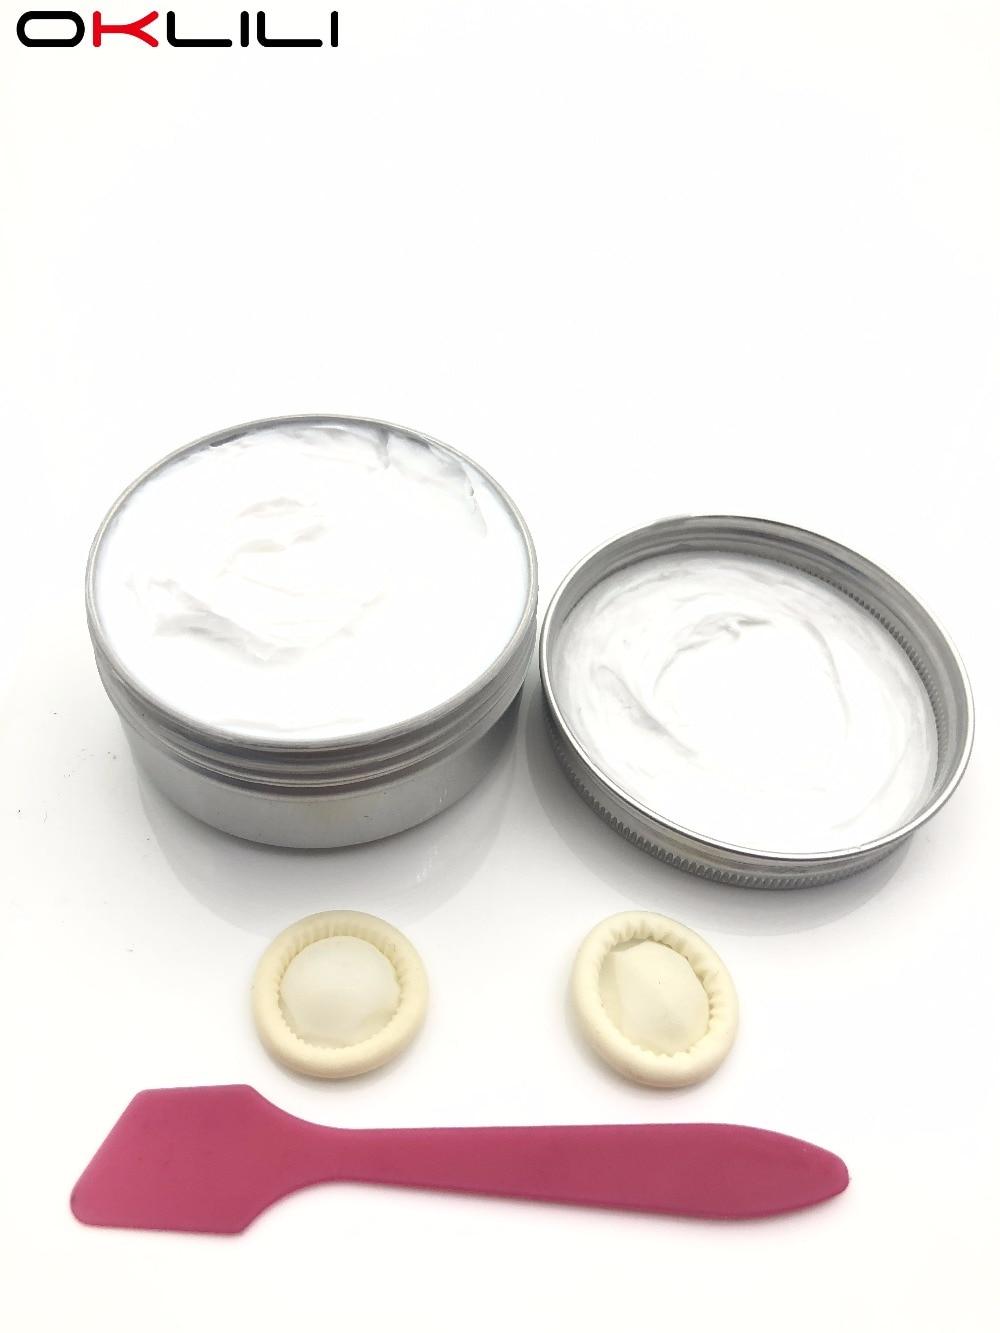 ORIGINAL 100g MOLYKOTE G8010 G 8010 Silicone Fuser Grease Oil lubricant for HP P4515 4250 4300